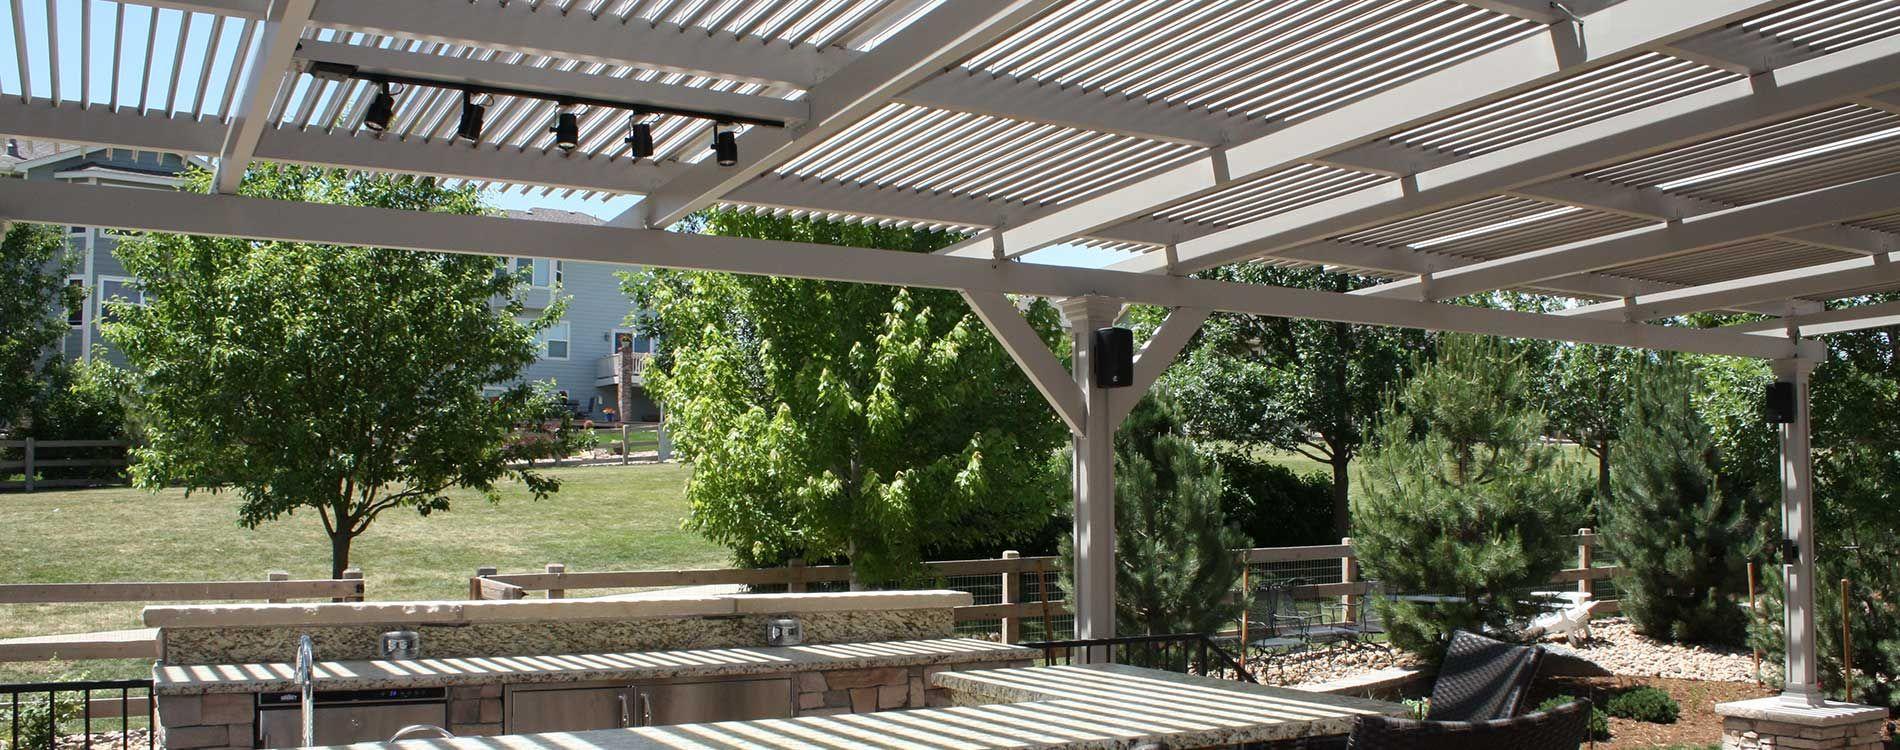 Decks And Patios Denver Colorado Patio Concepts throughout size 1900 X 750